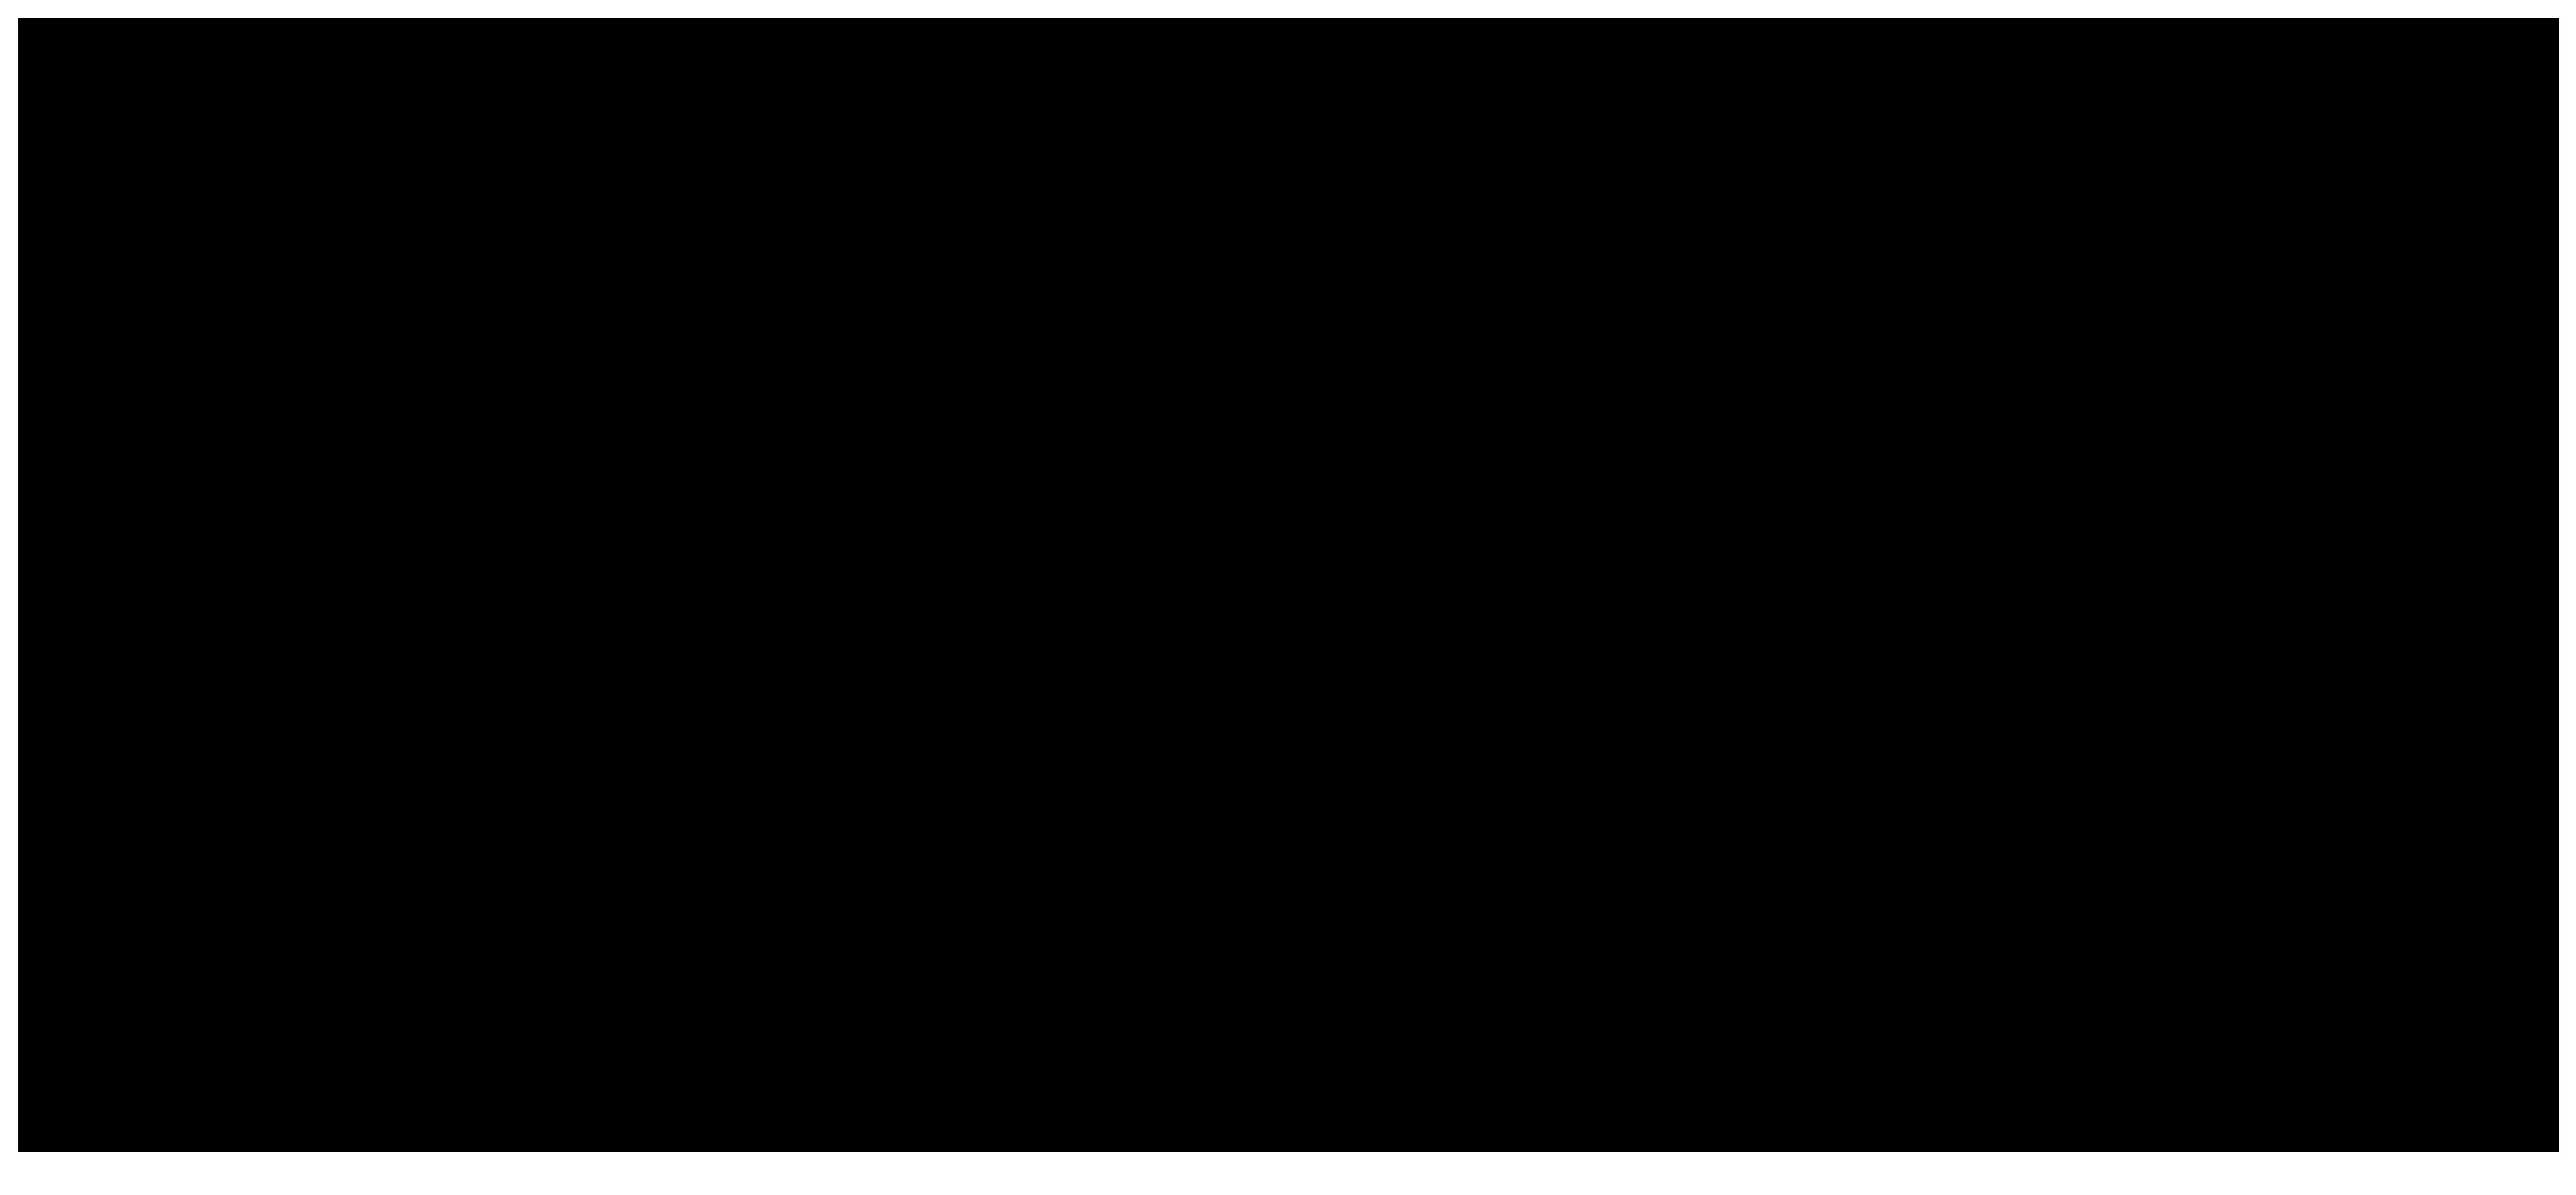 Puma Silhouette PNG Clip Art Image.